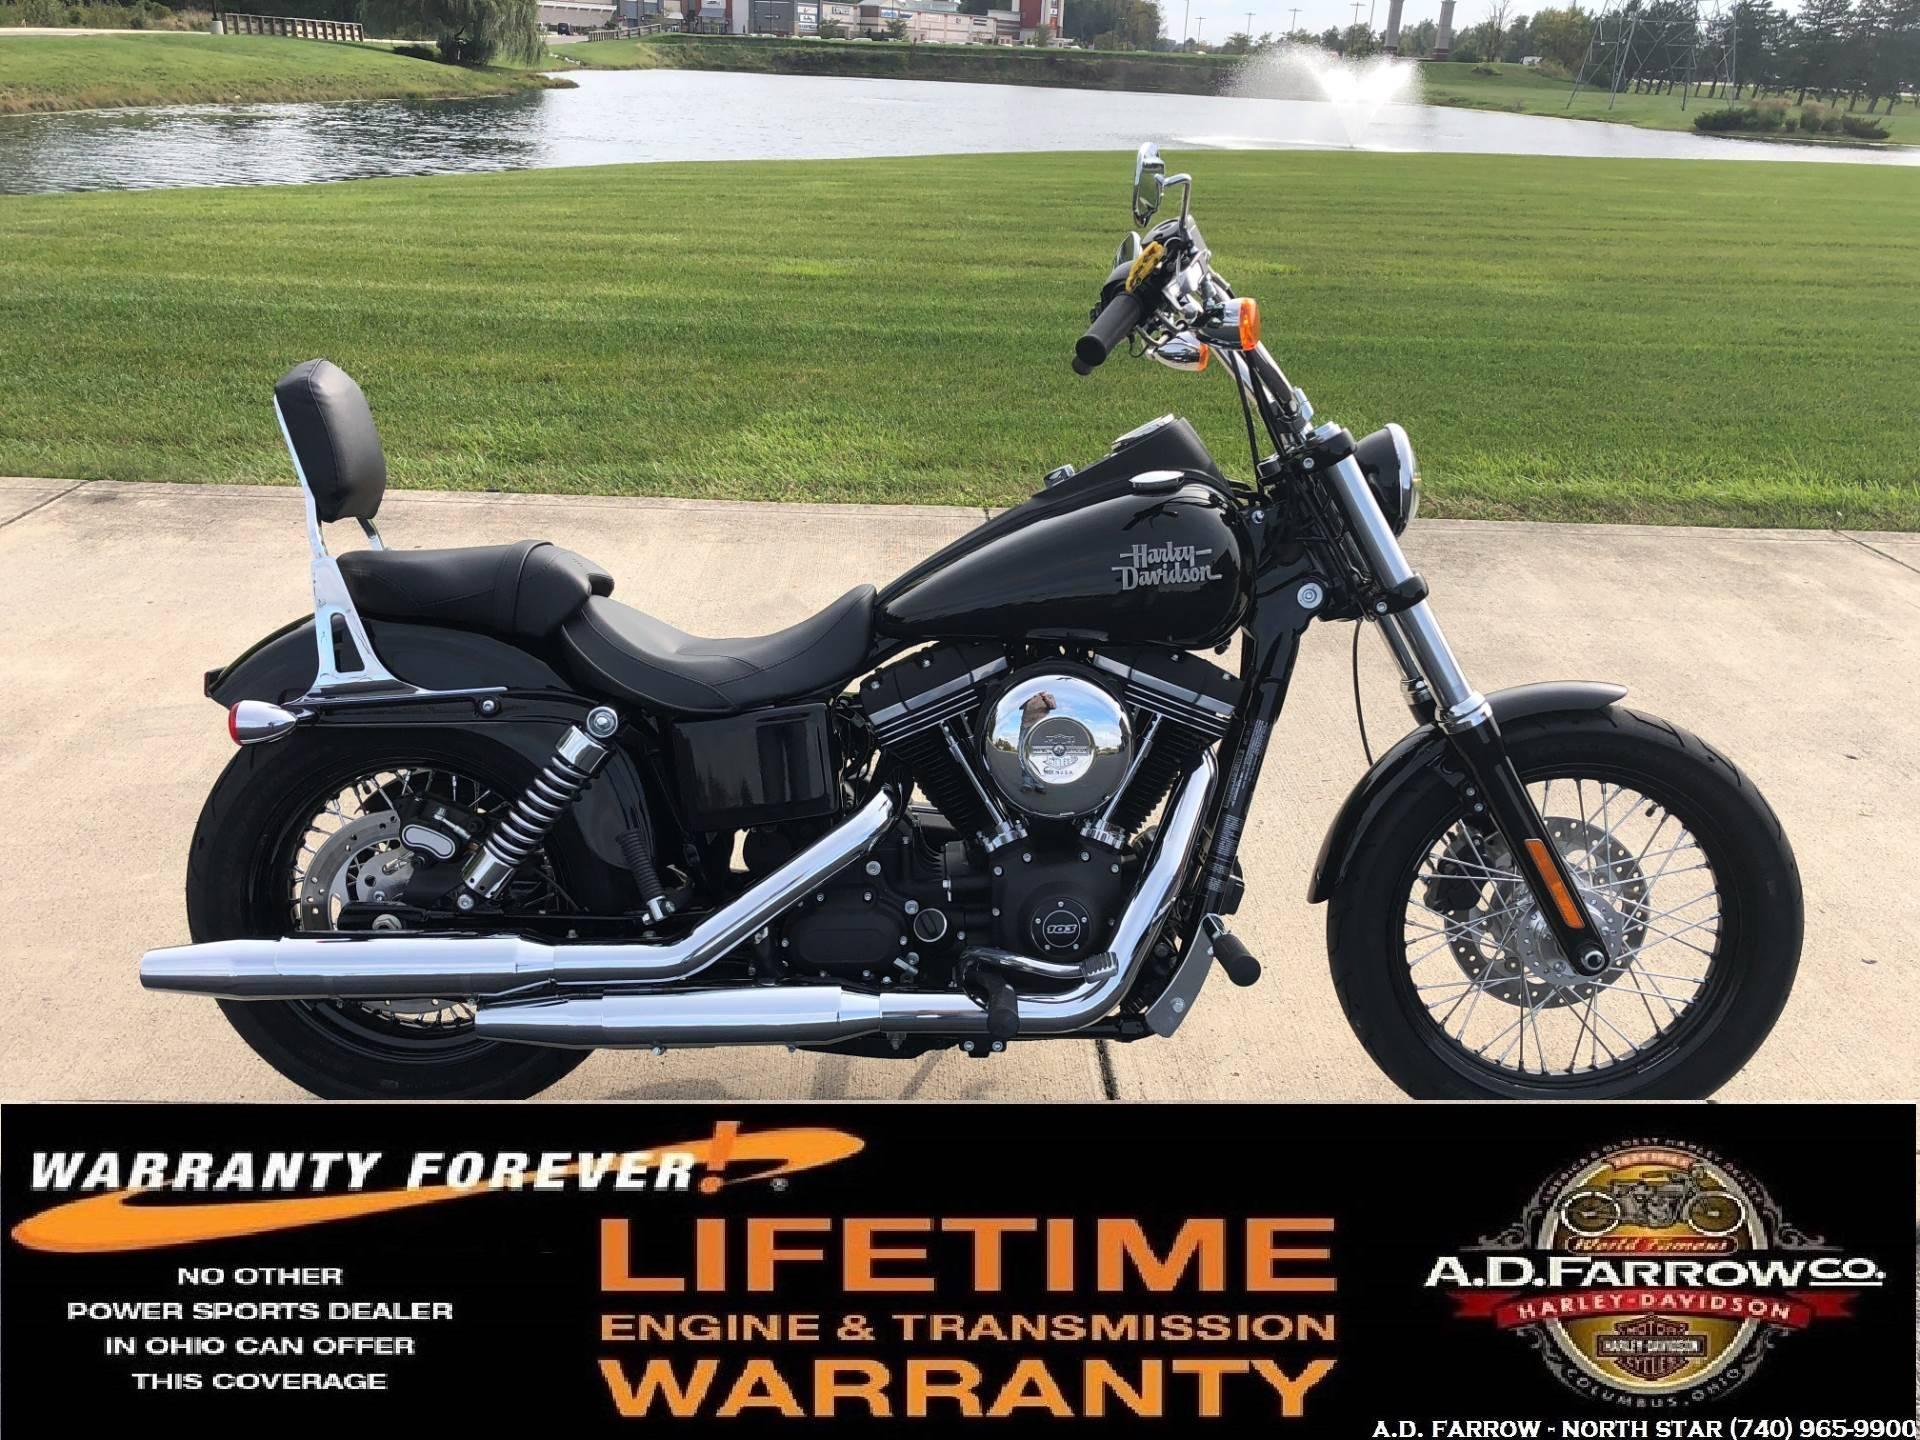 2016 Harley Davidson Street Bob In Sunbury Ohio Photo 1